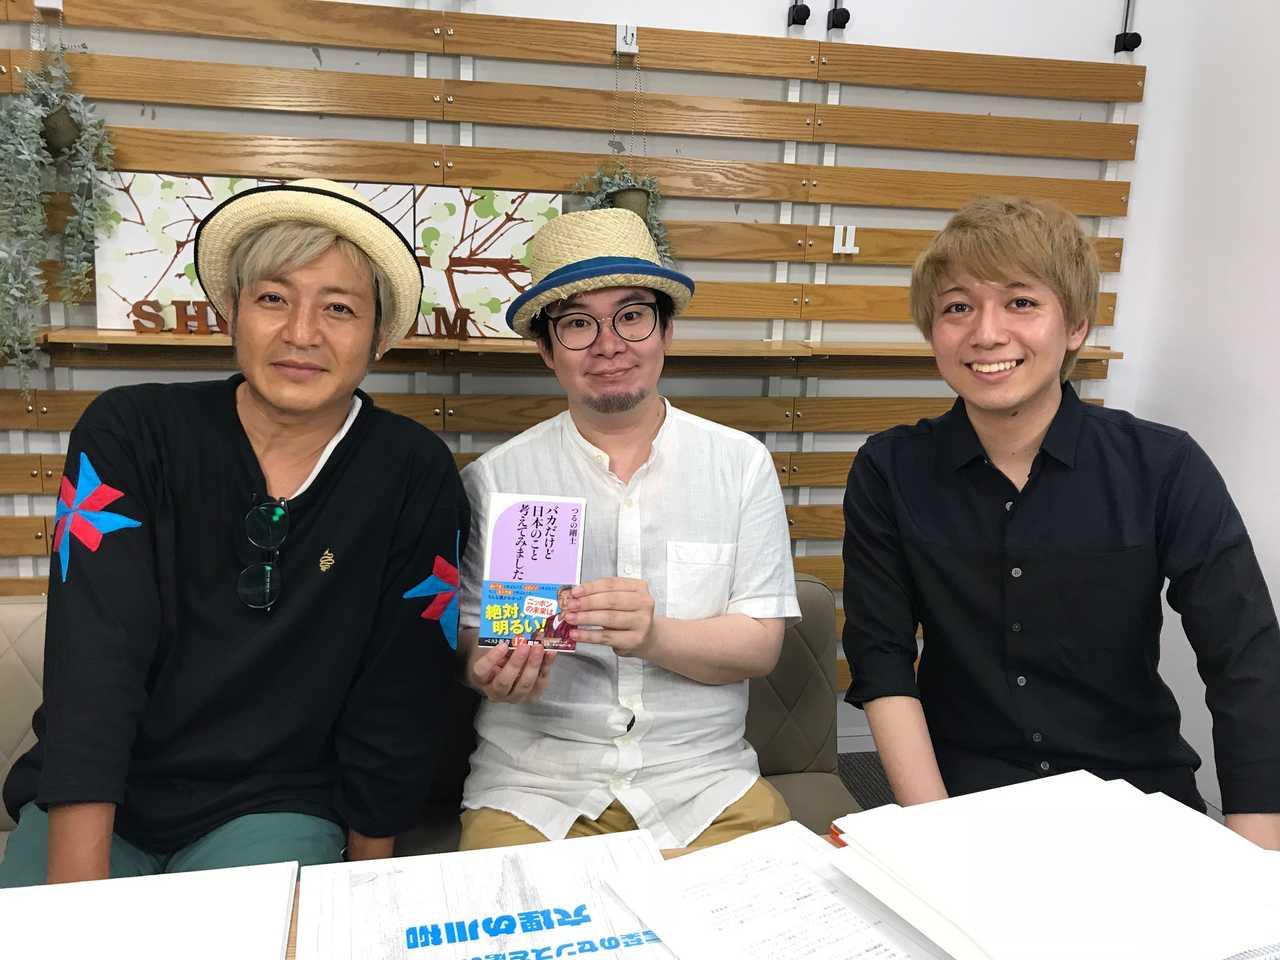 つるの剛士、脚本家・放送作家 坪田塁、専属作家 太田 晴之